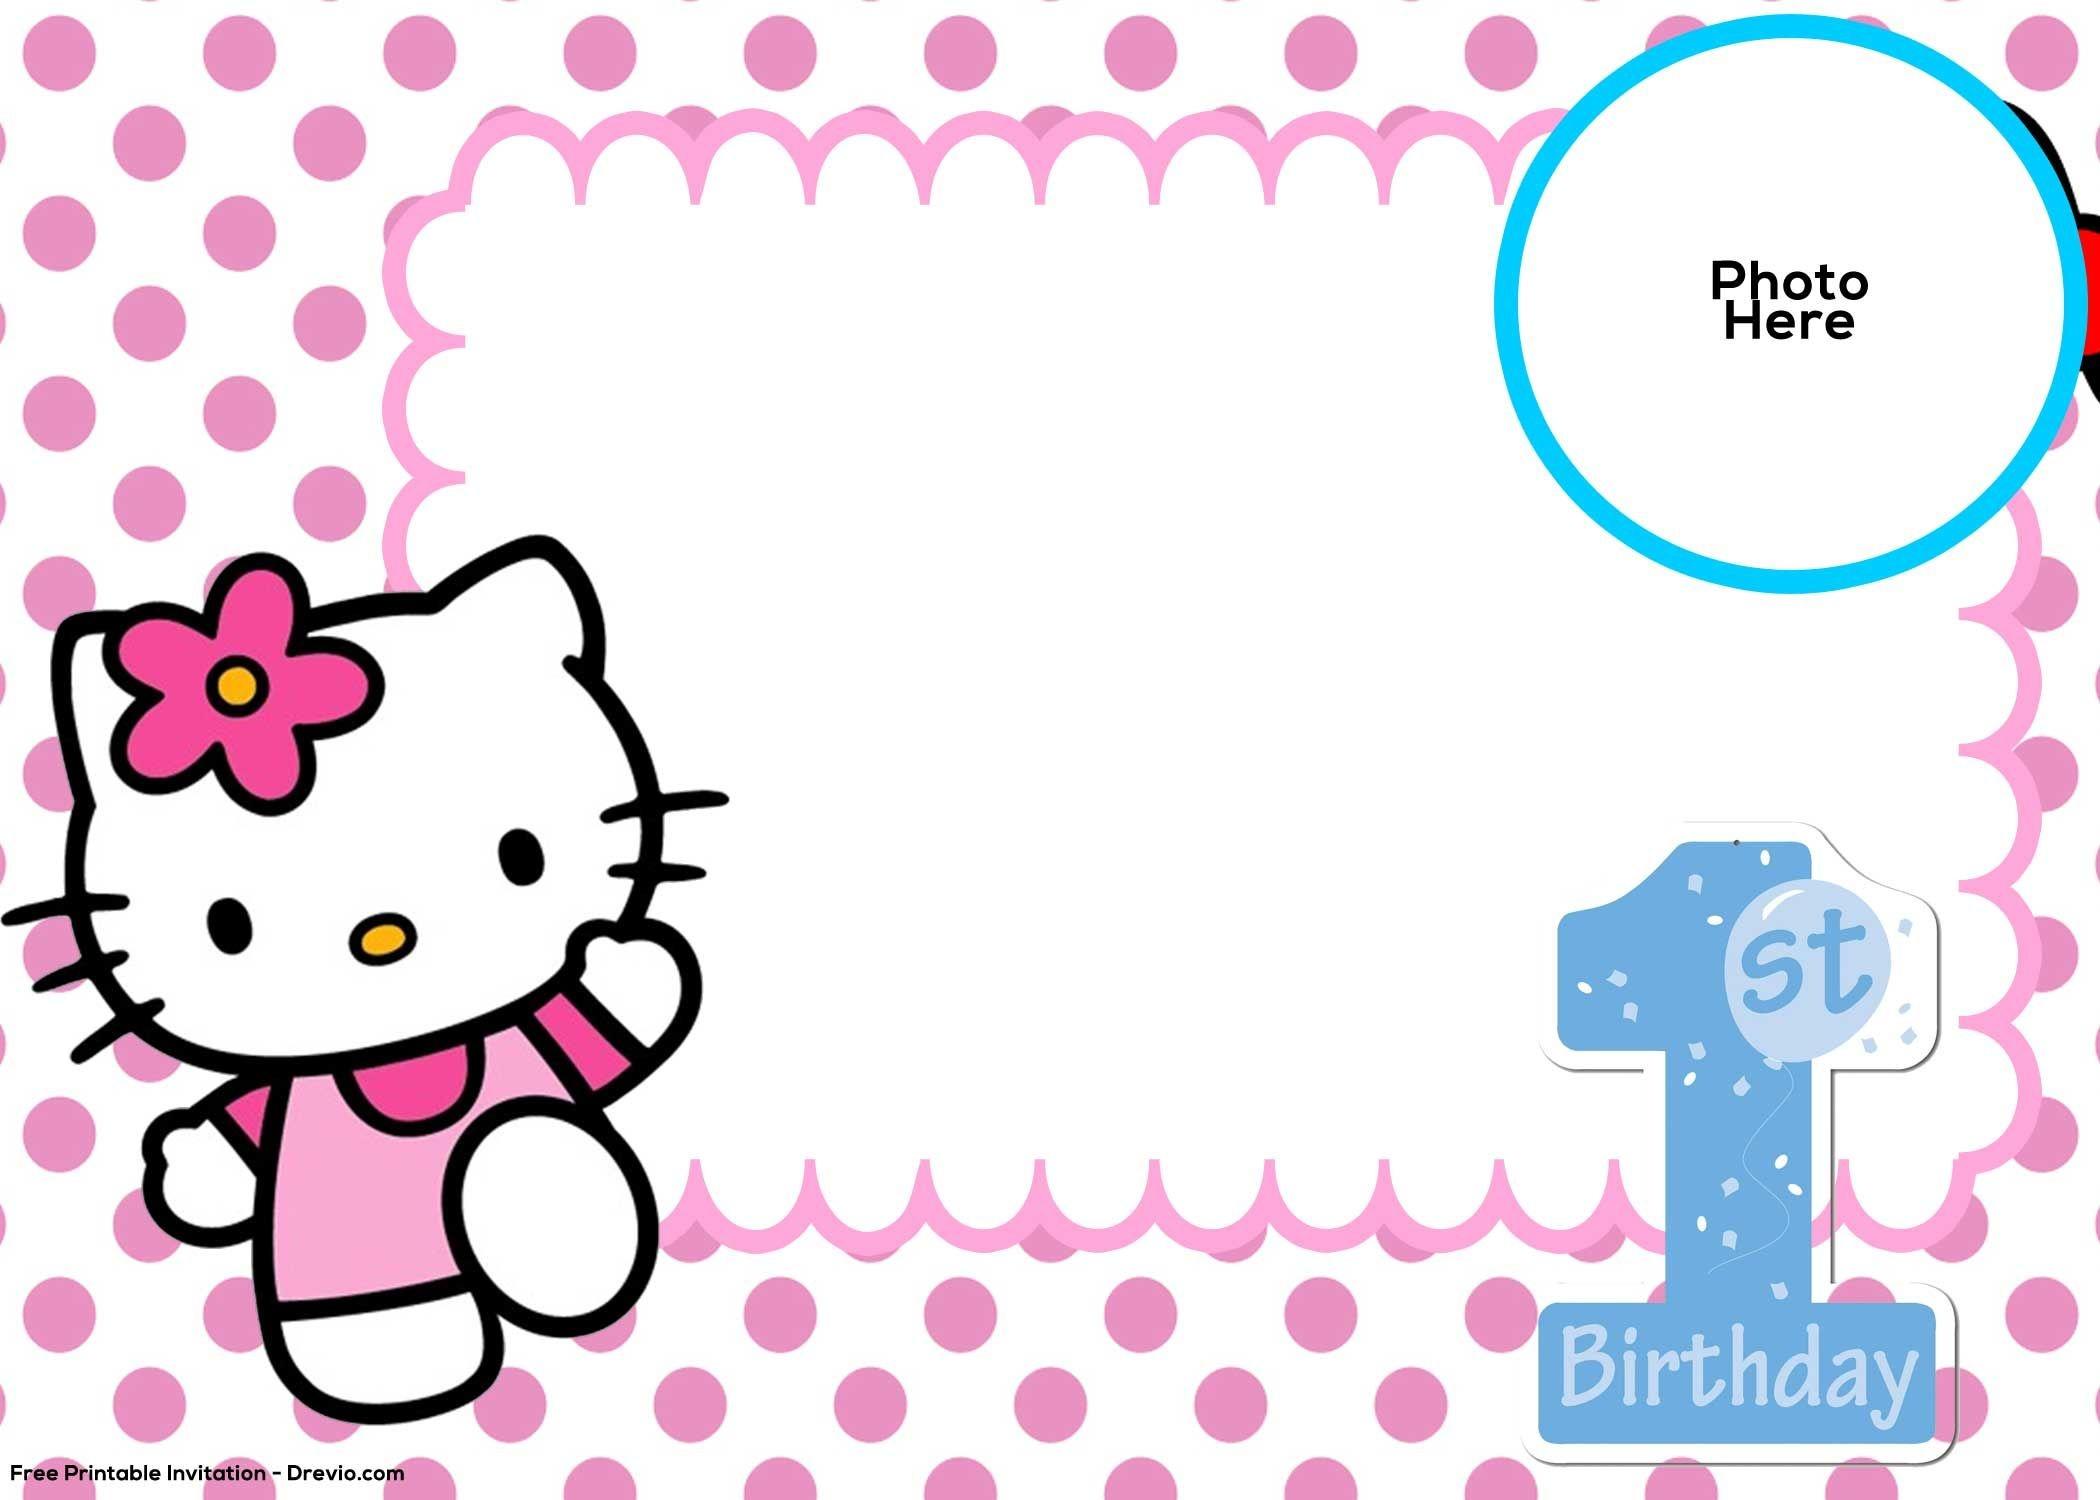 Free Hello Kitty 1St Birthday Invitation | Birthday Invitation - Hello Kitty Free Printable Invitations For Birthday